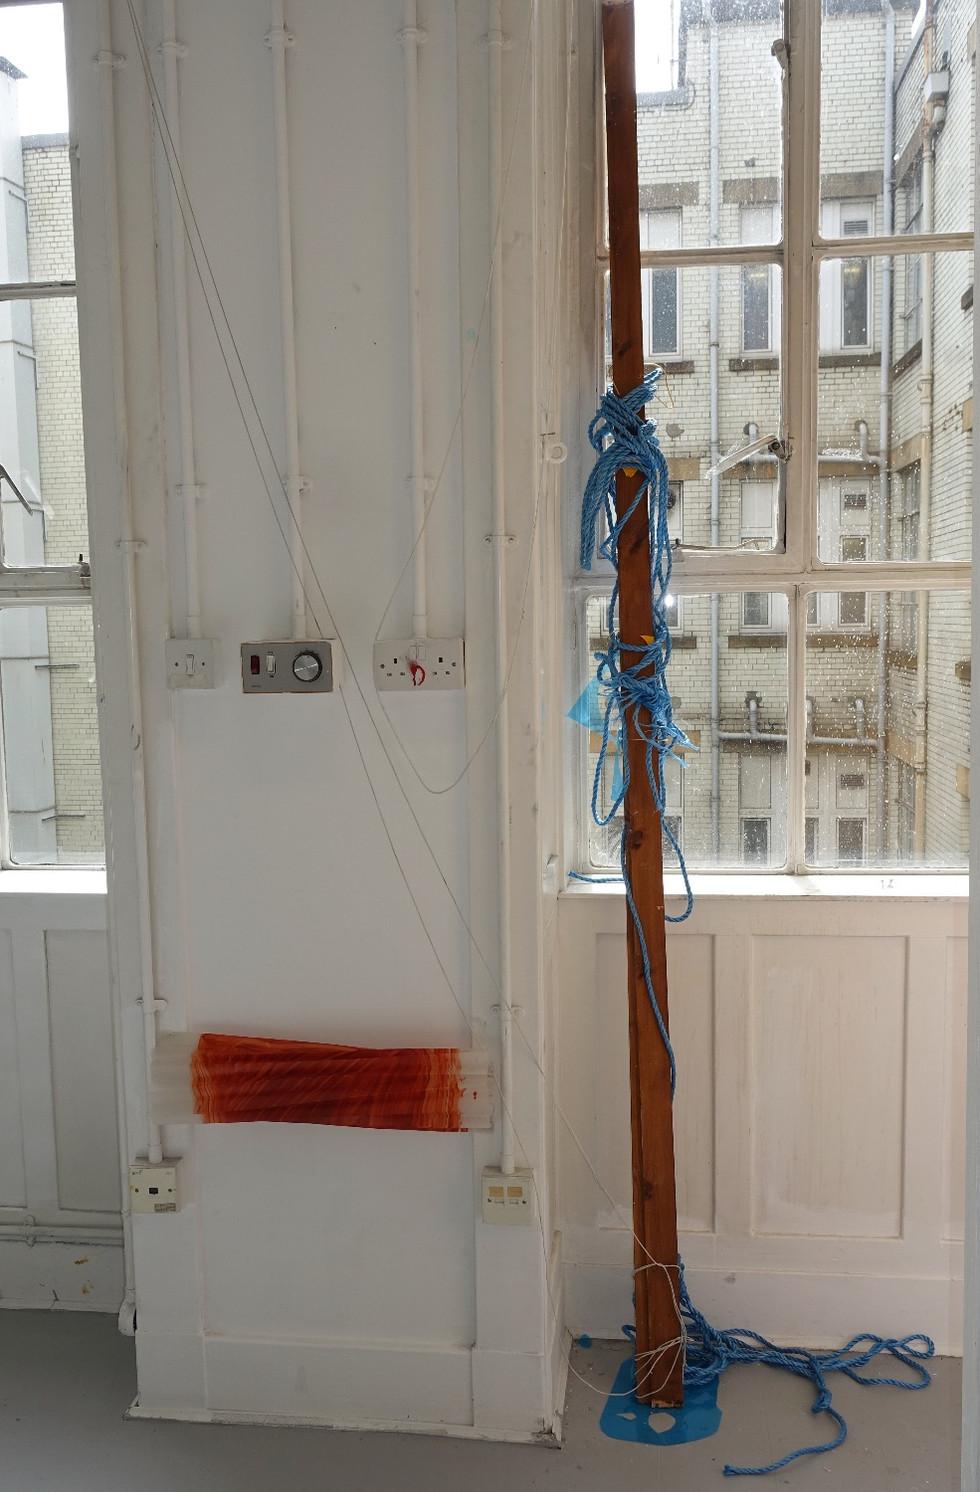 Fishing pole and net